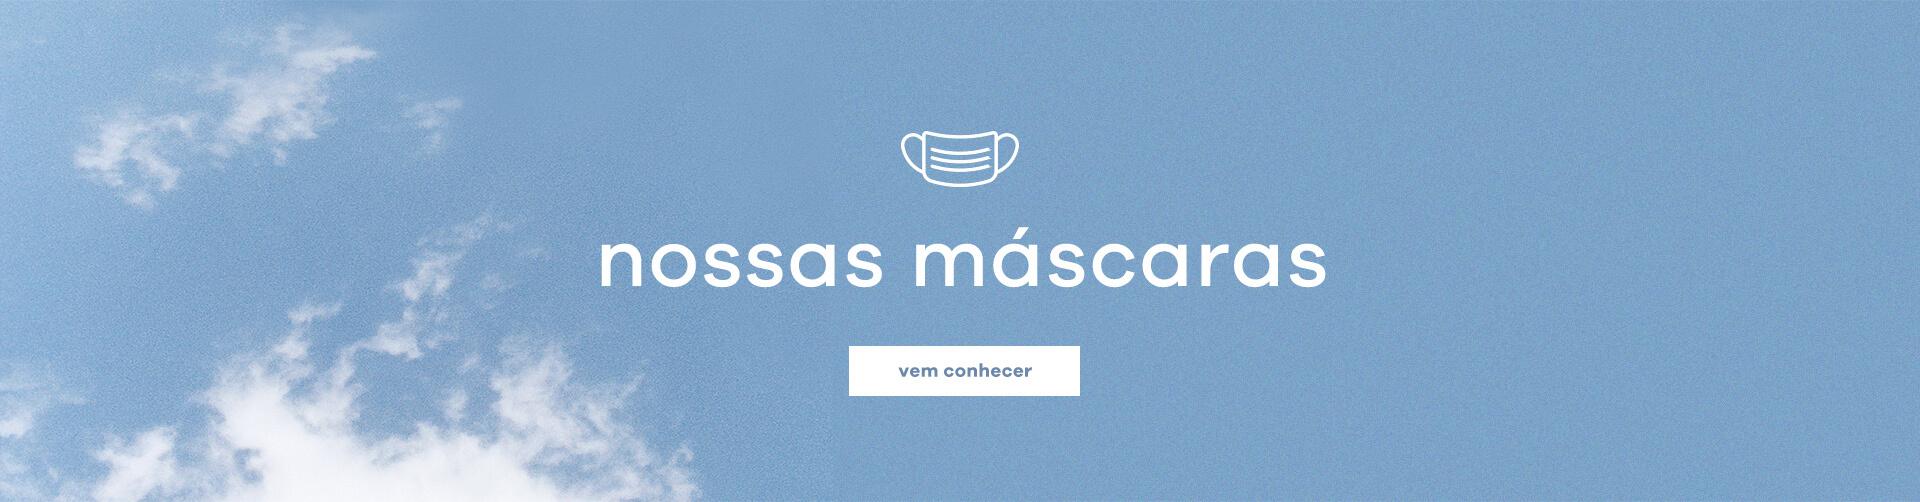 banner nossas mascaras